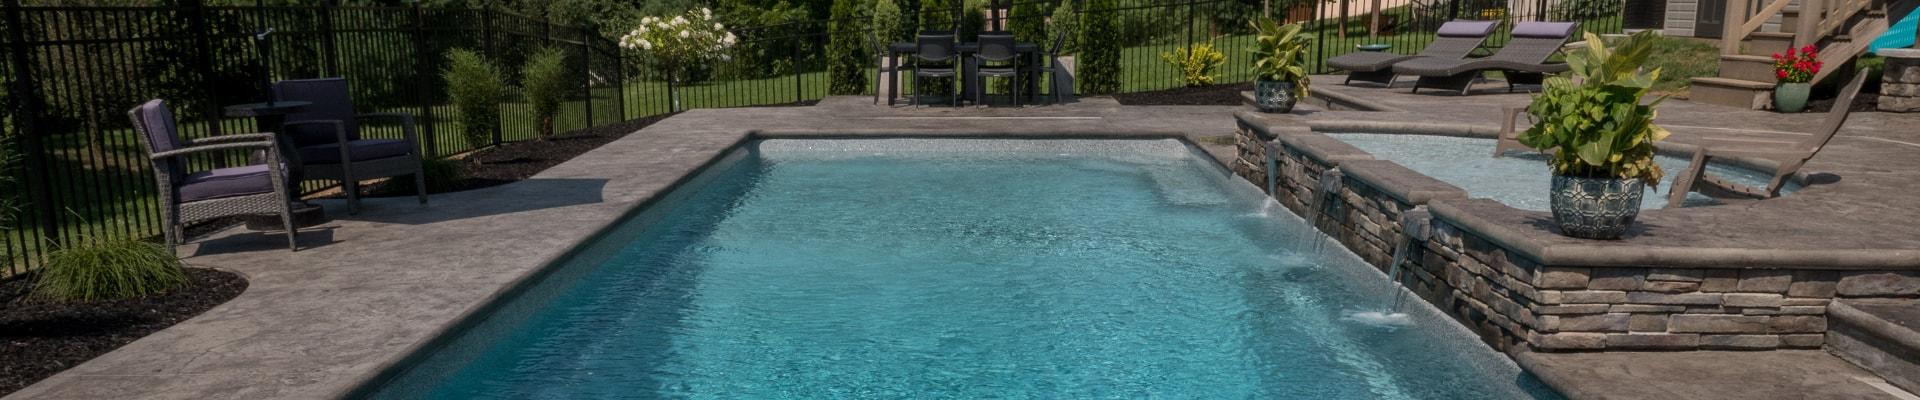 Image of Pool